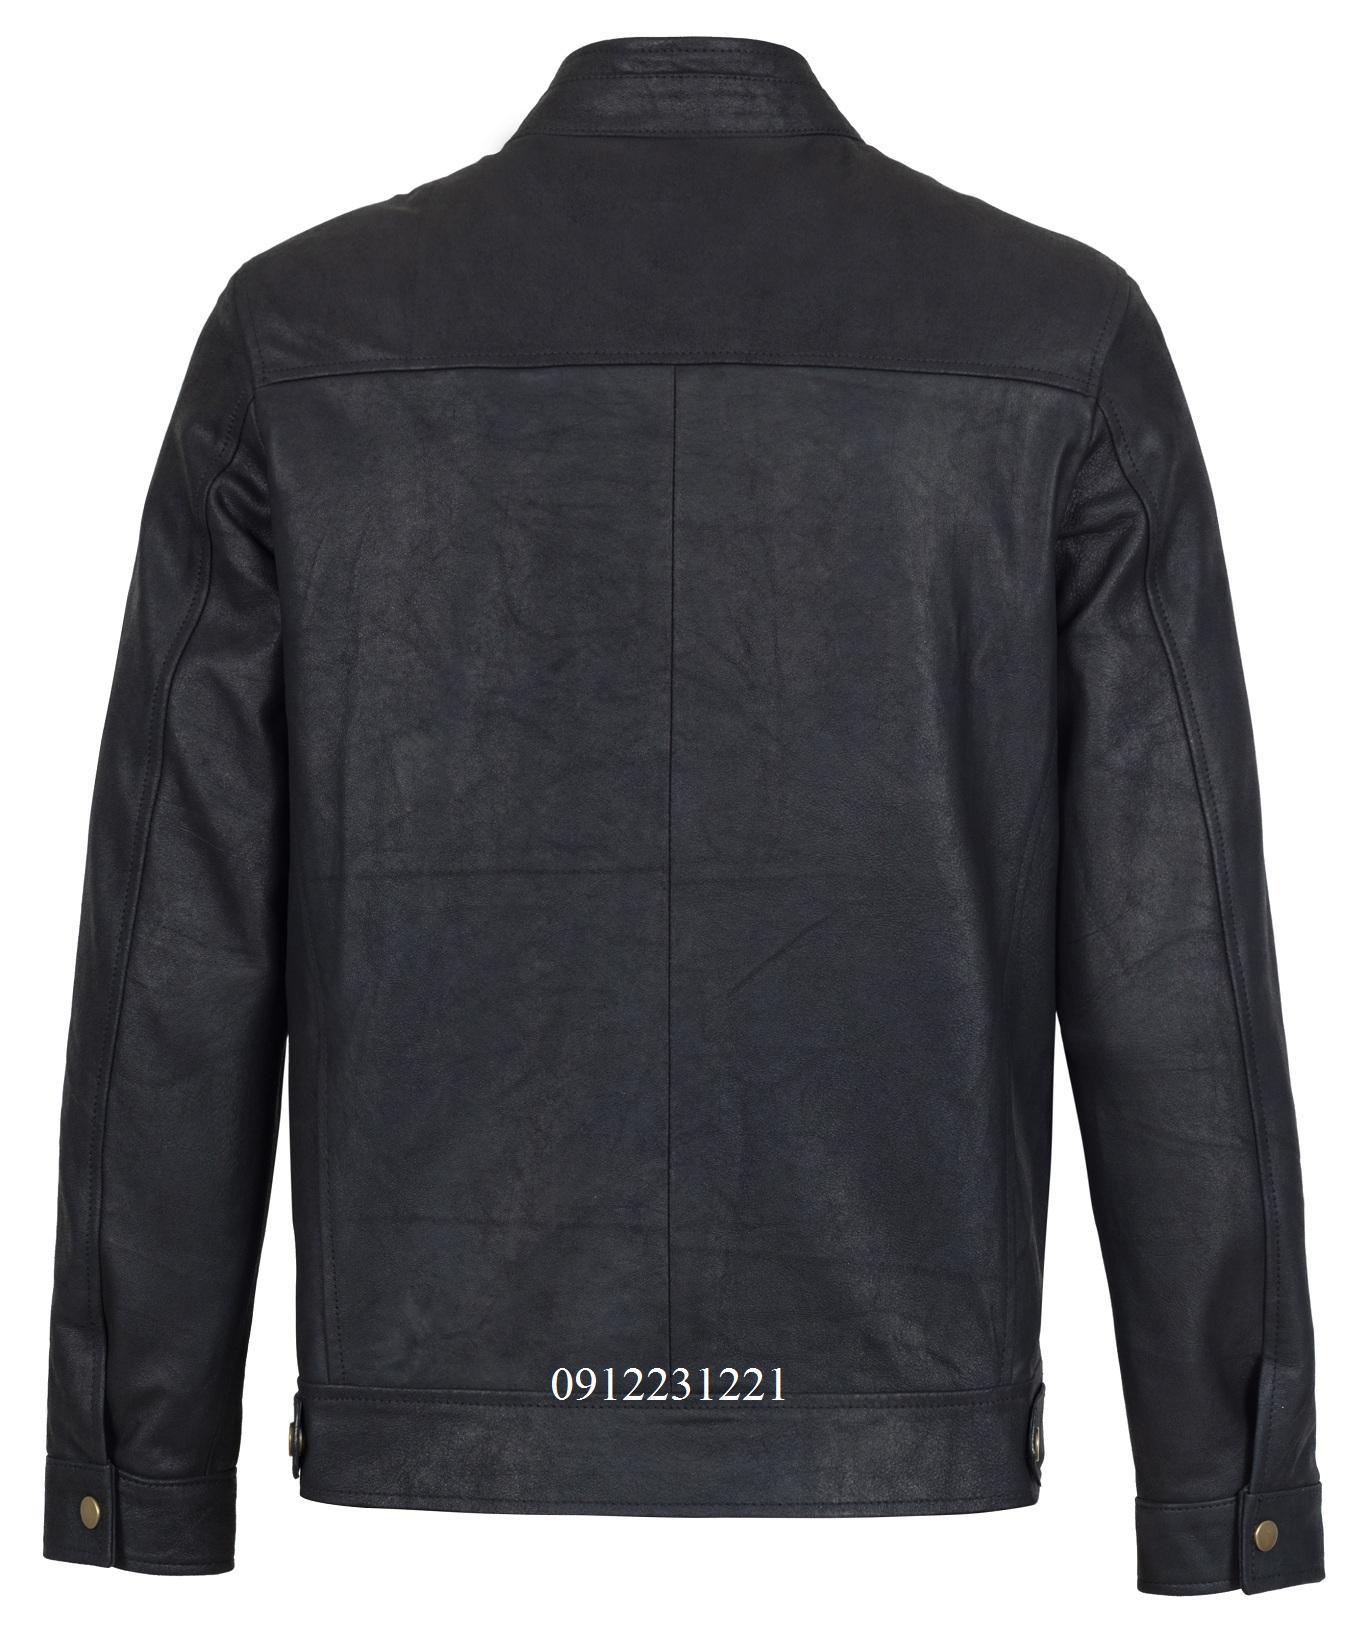 áo da cừu racer jacket